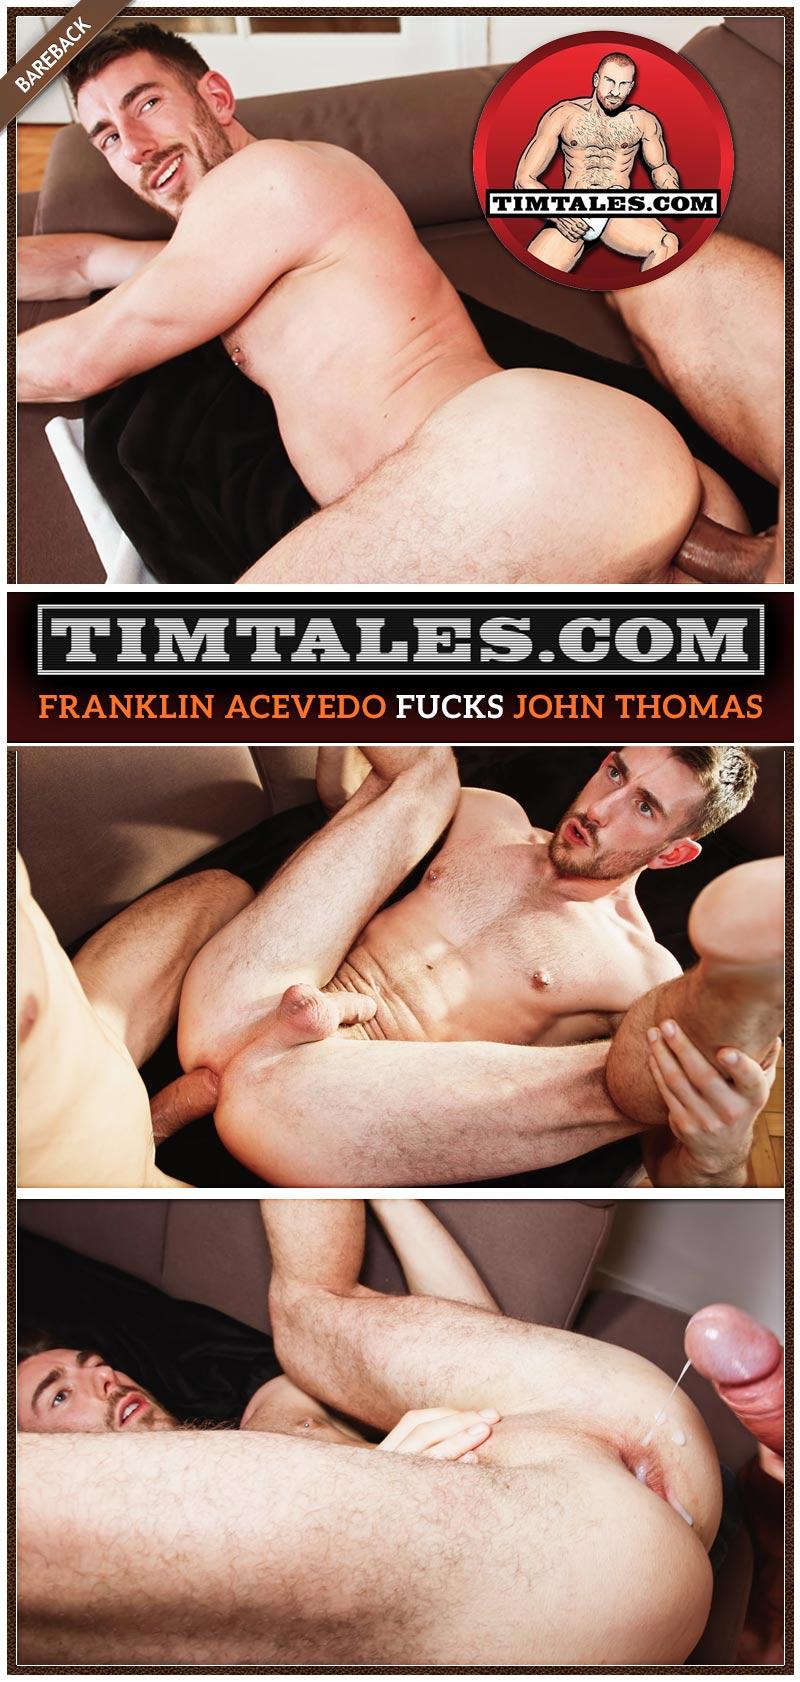 Franklin Acevedo Fucks John Thomas at TimTales